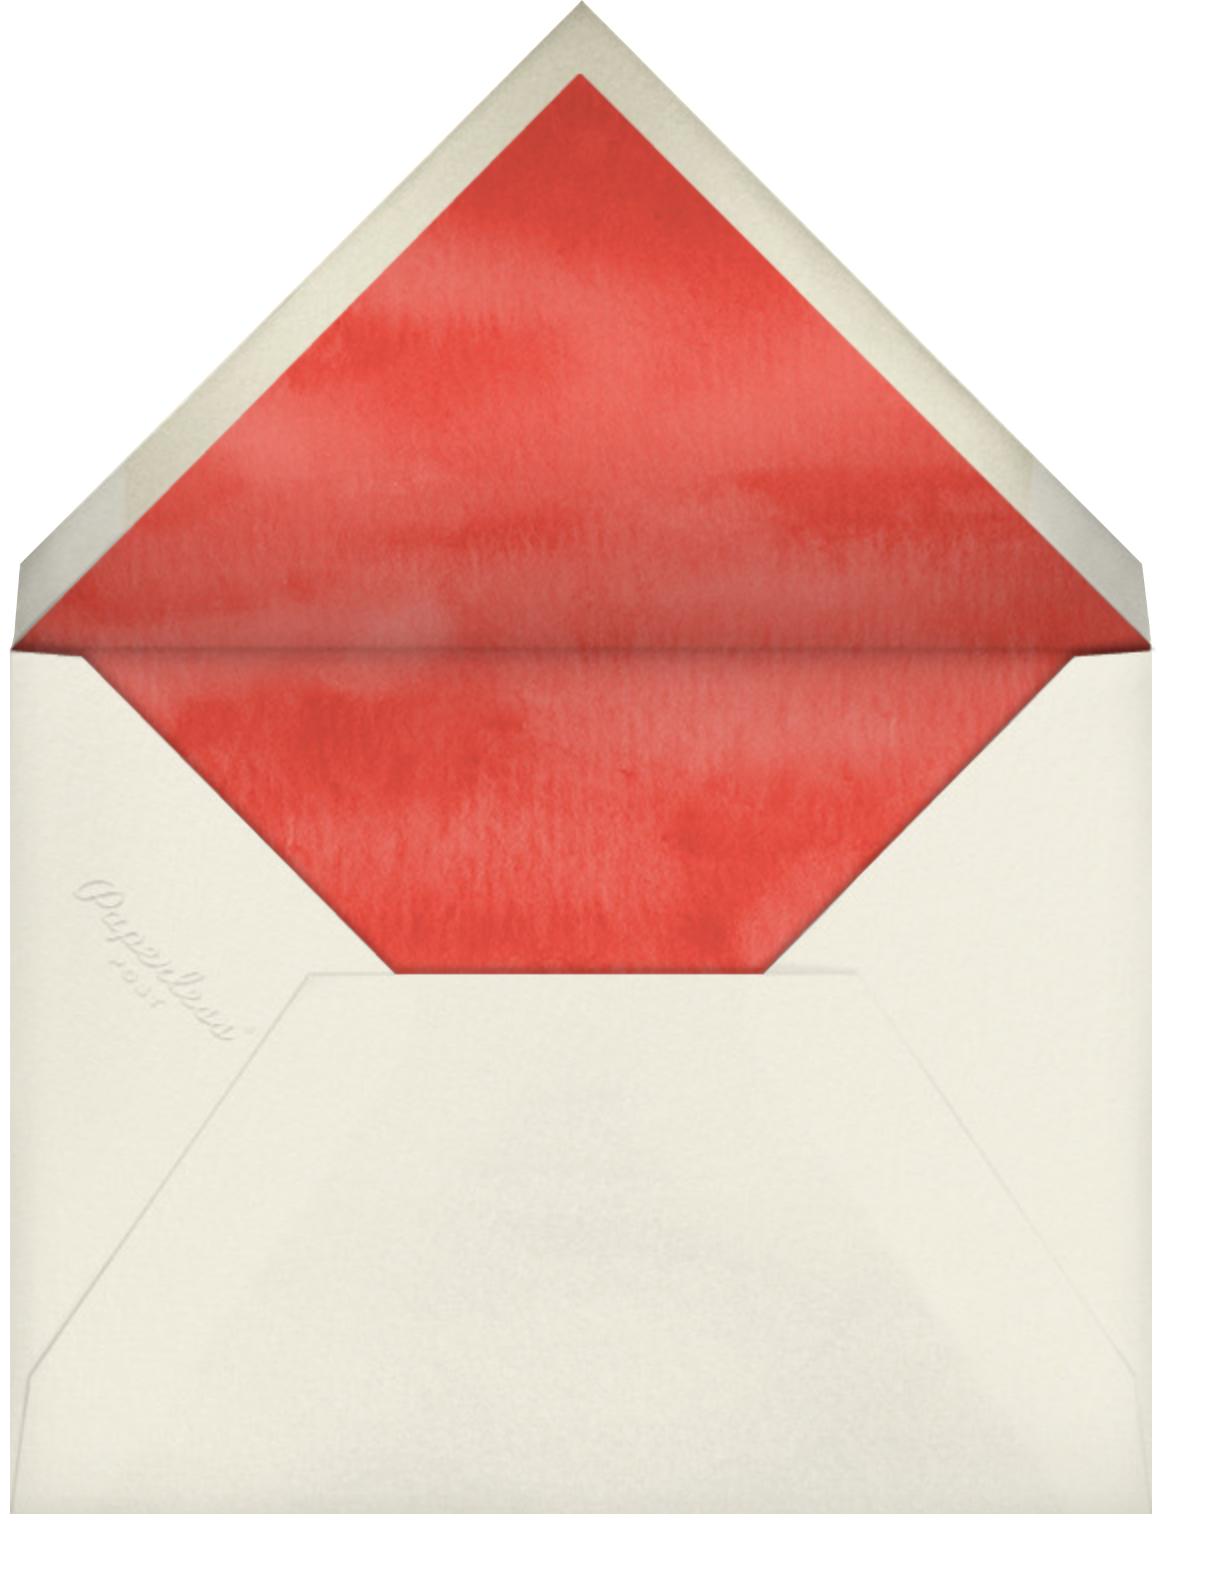 Juggle All the Way - Felix Doolittle - Company holiday cards - envelope back